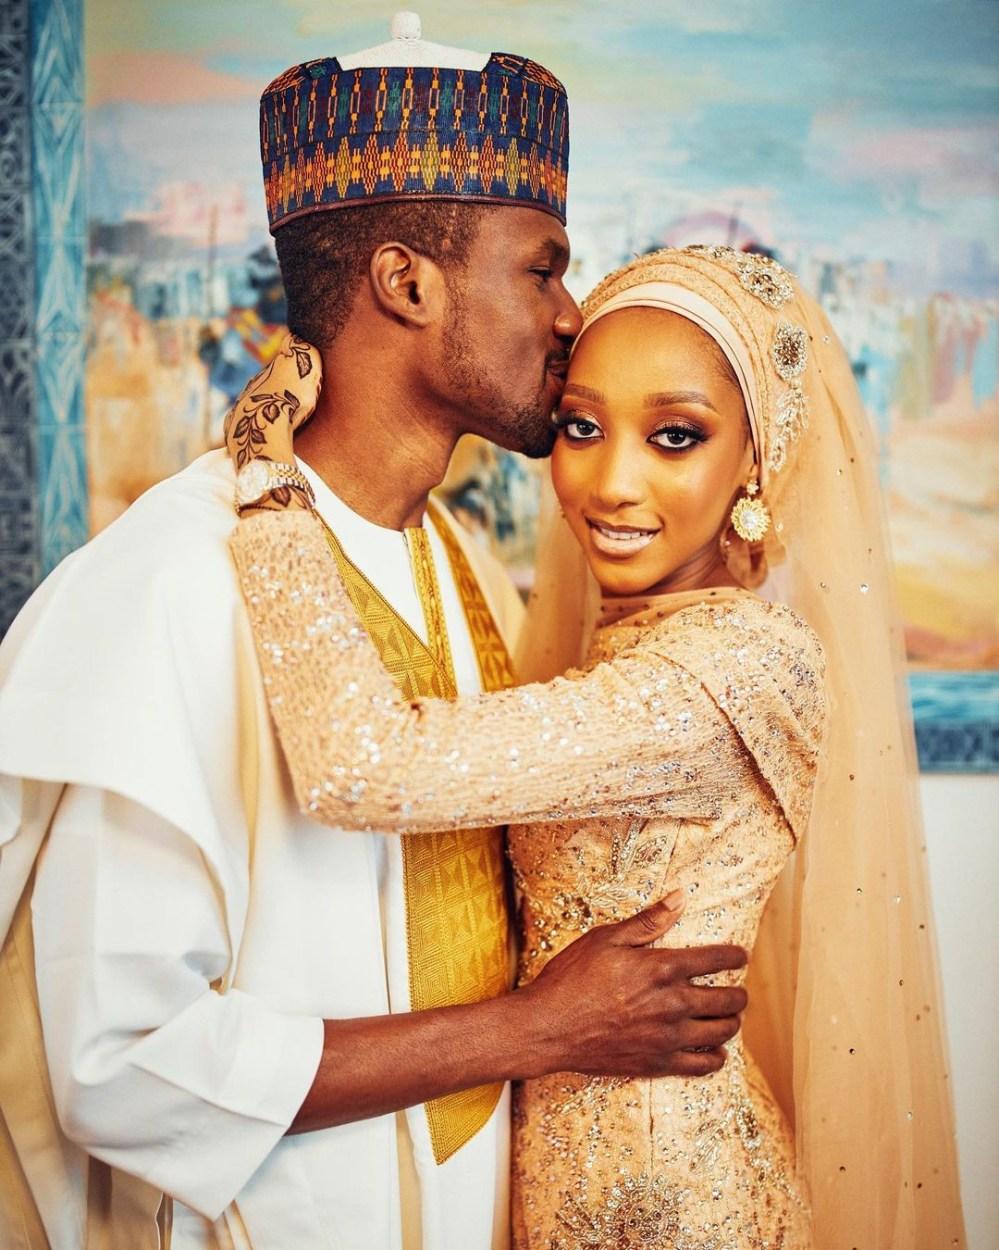 More photos of newlyweds, Yusuf and Zahra Buhari